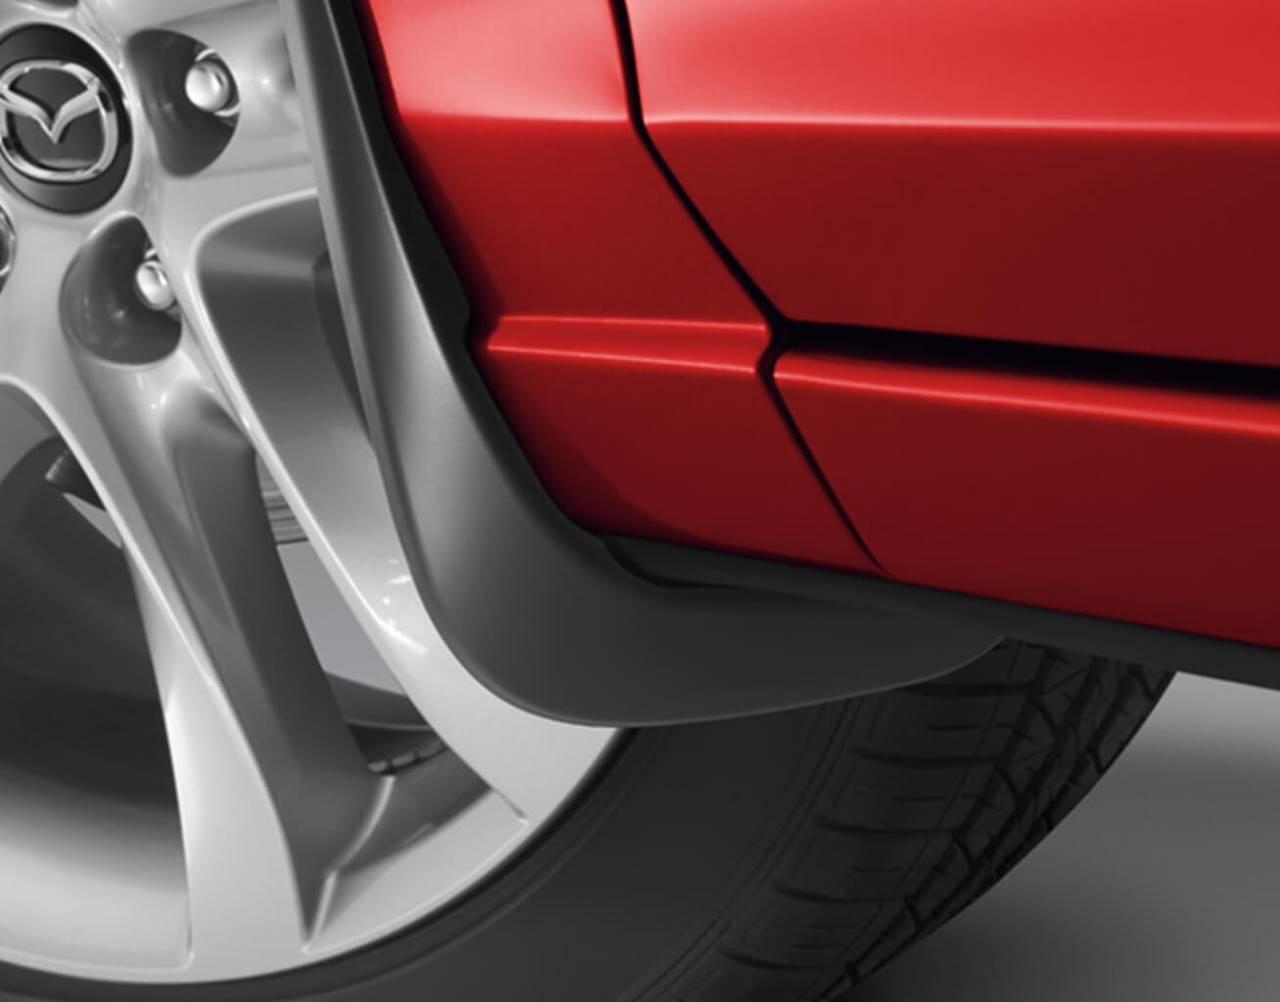 2018 Mazda6, SPLASH GUARDS, FRONT<sup>*</sup>